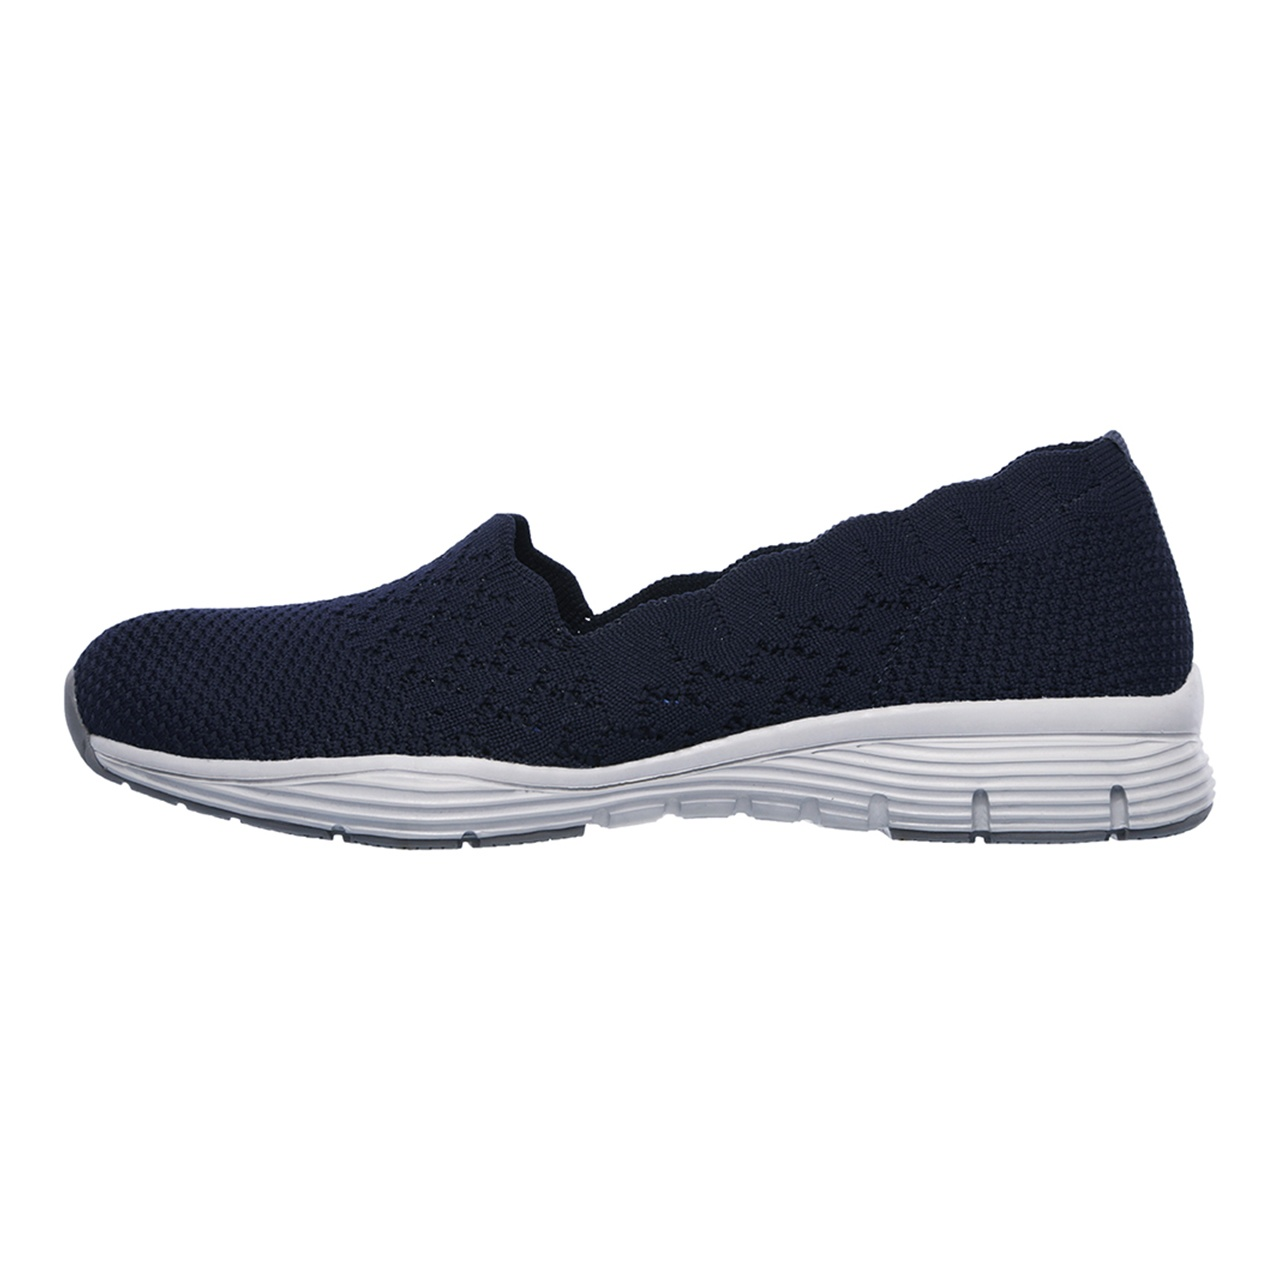 کفش مخصوص پیاده روی زنانه اسکچرز مدل MIRACLE 49481 NVY